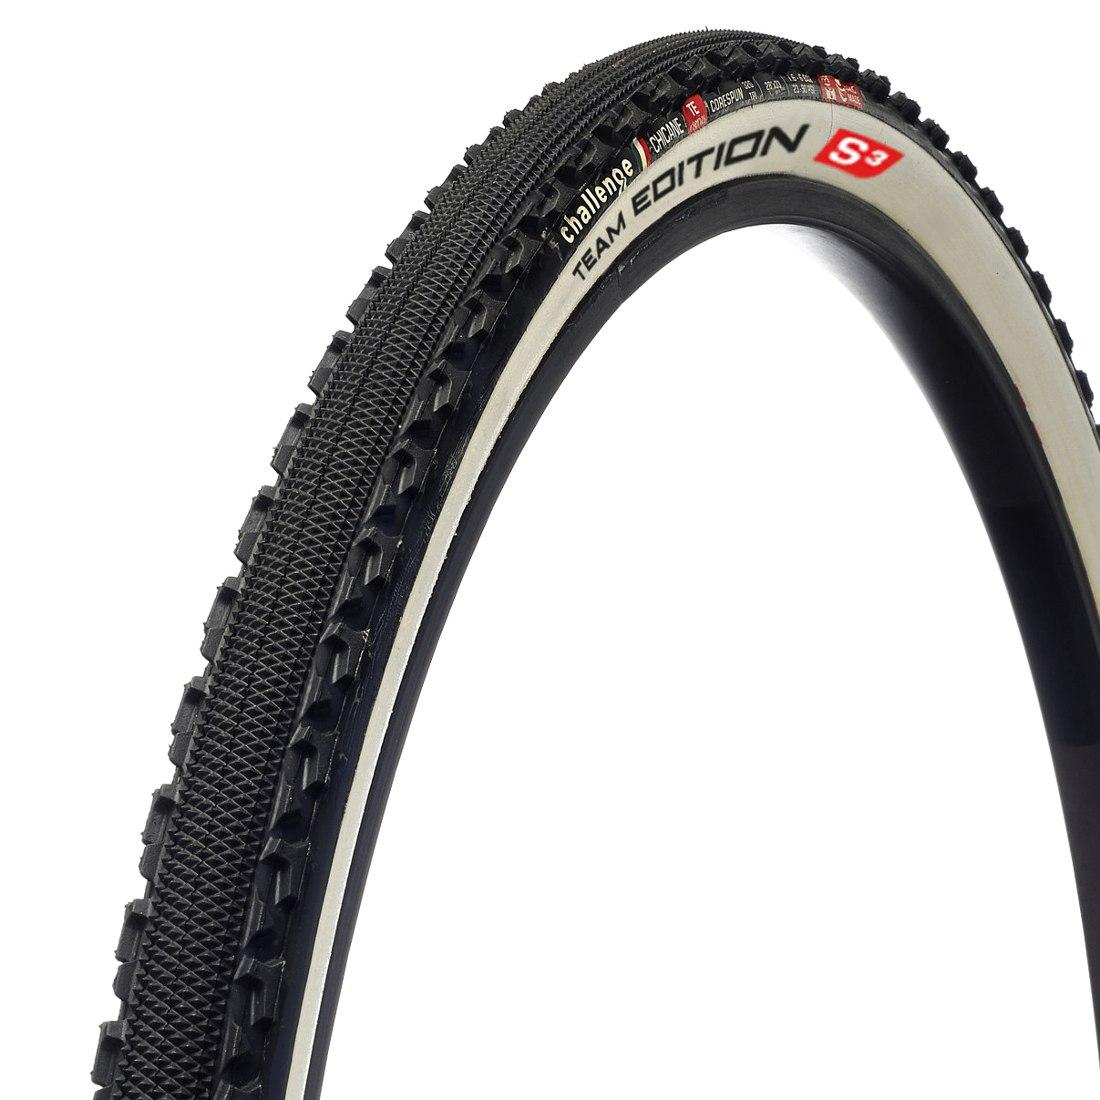 Challenge Chicane Team Edition S Tubular Tire - 33-622